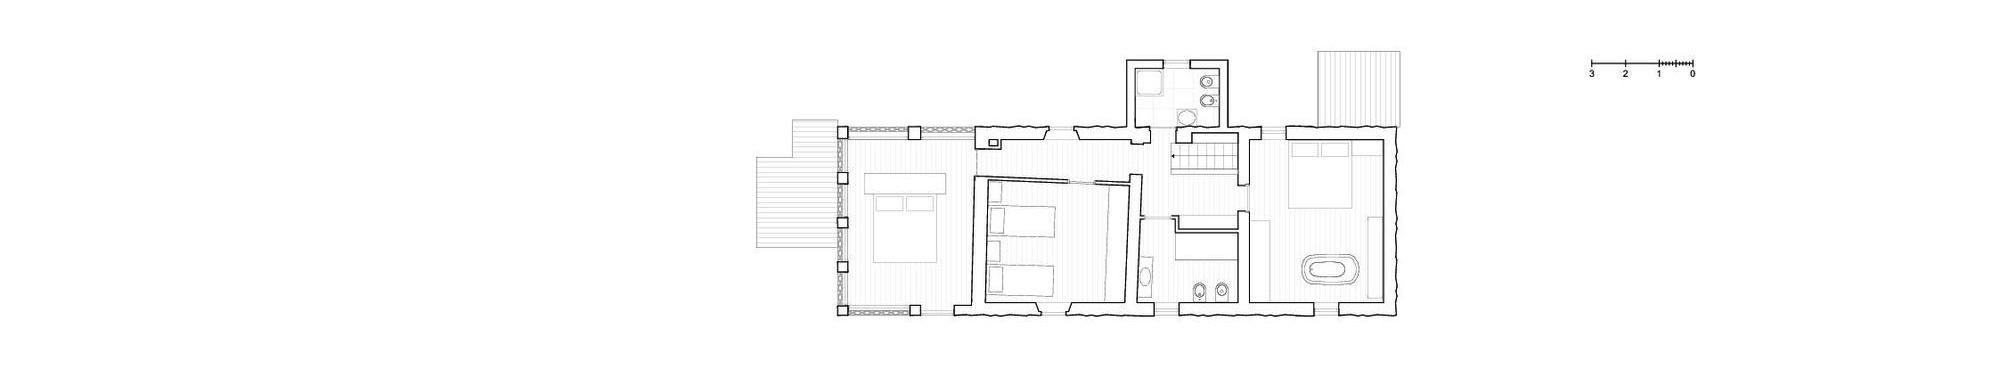 floor_(3).jpg